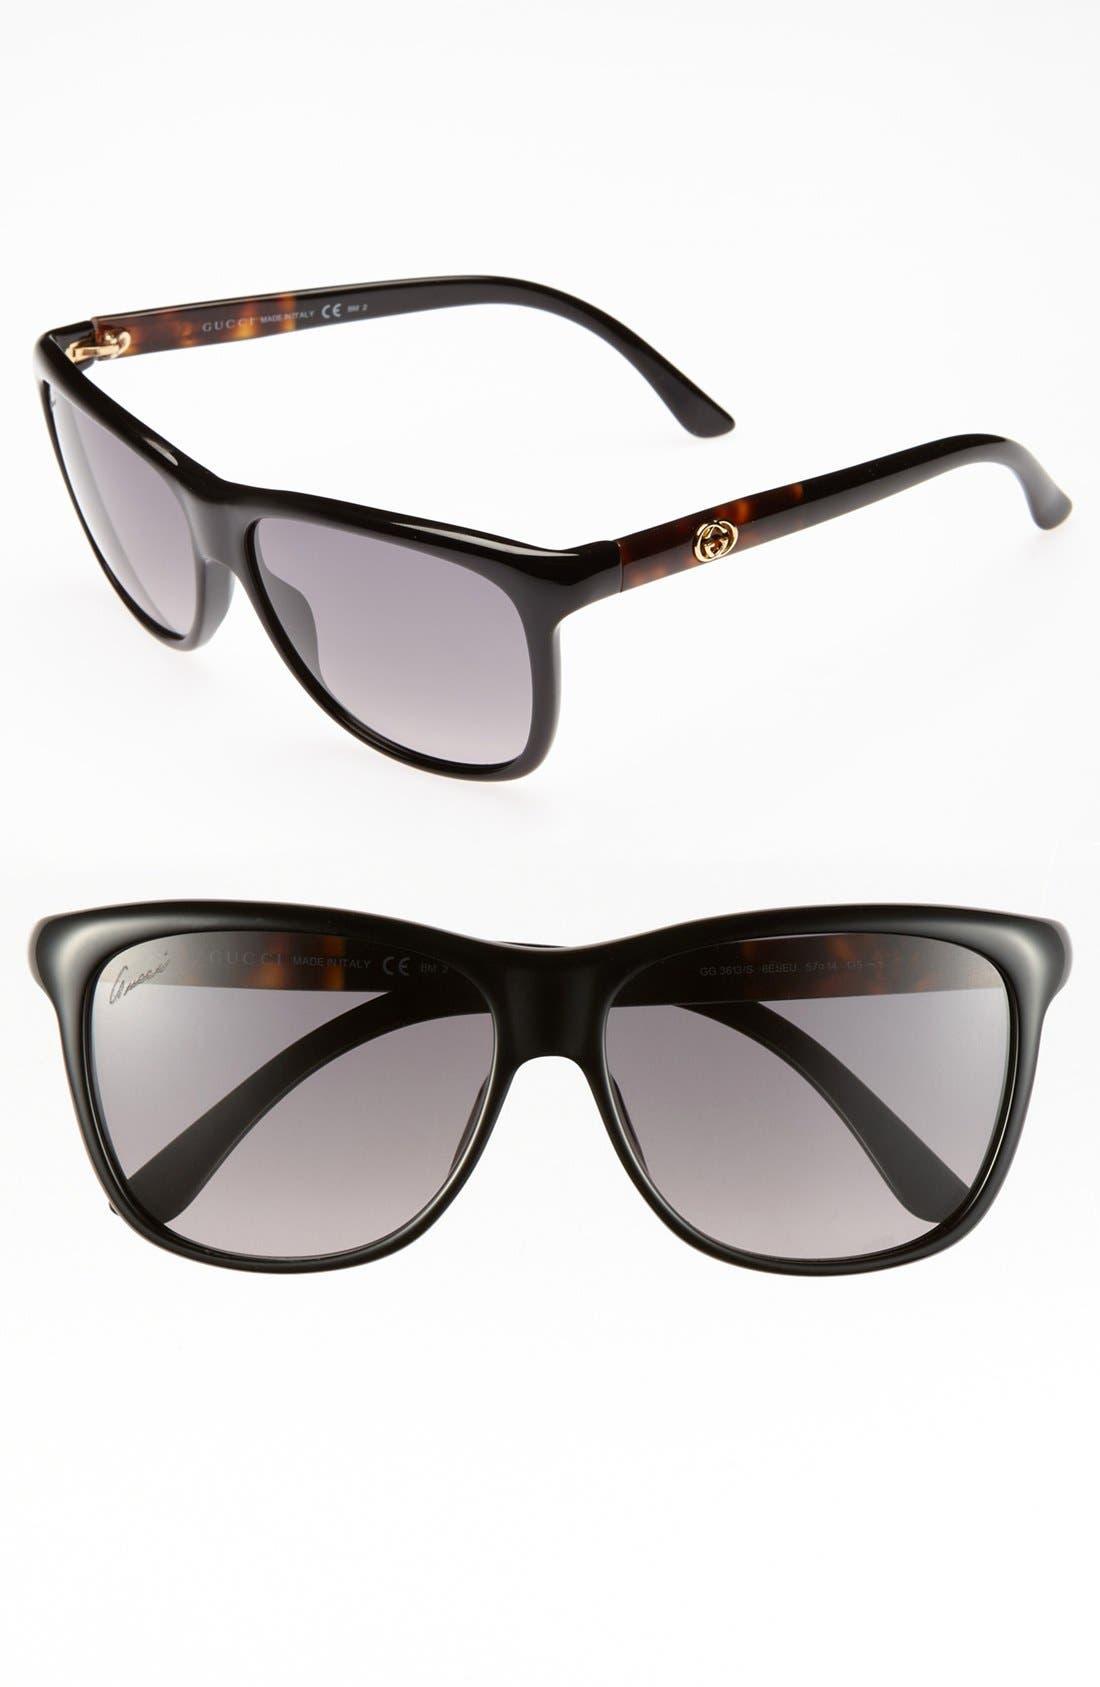 Alternate Image 1 Selected - Gucci 57mm Retro Sunglasses